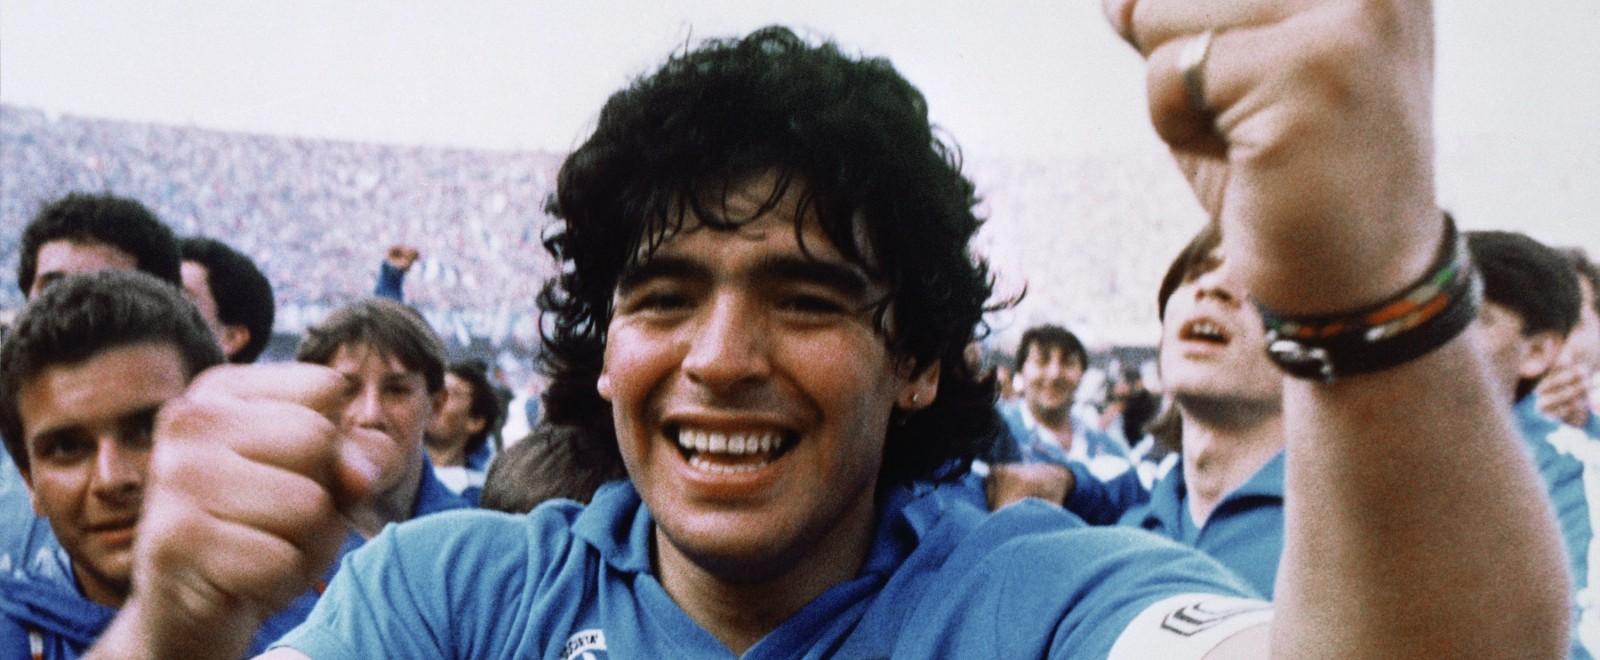 Maradona documentary to release in June